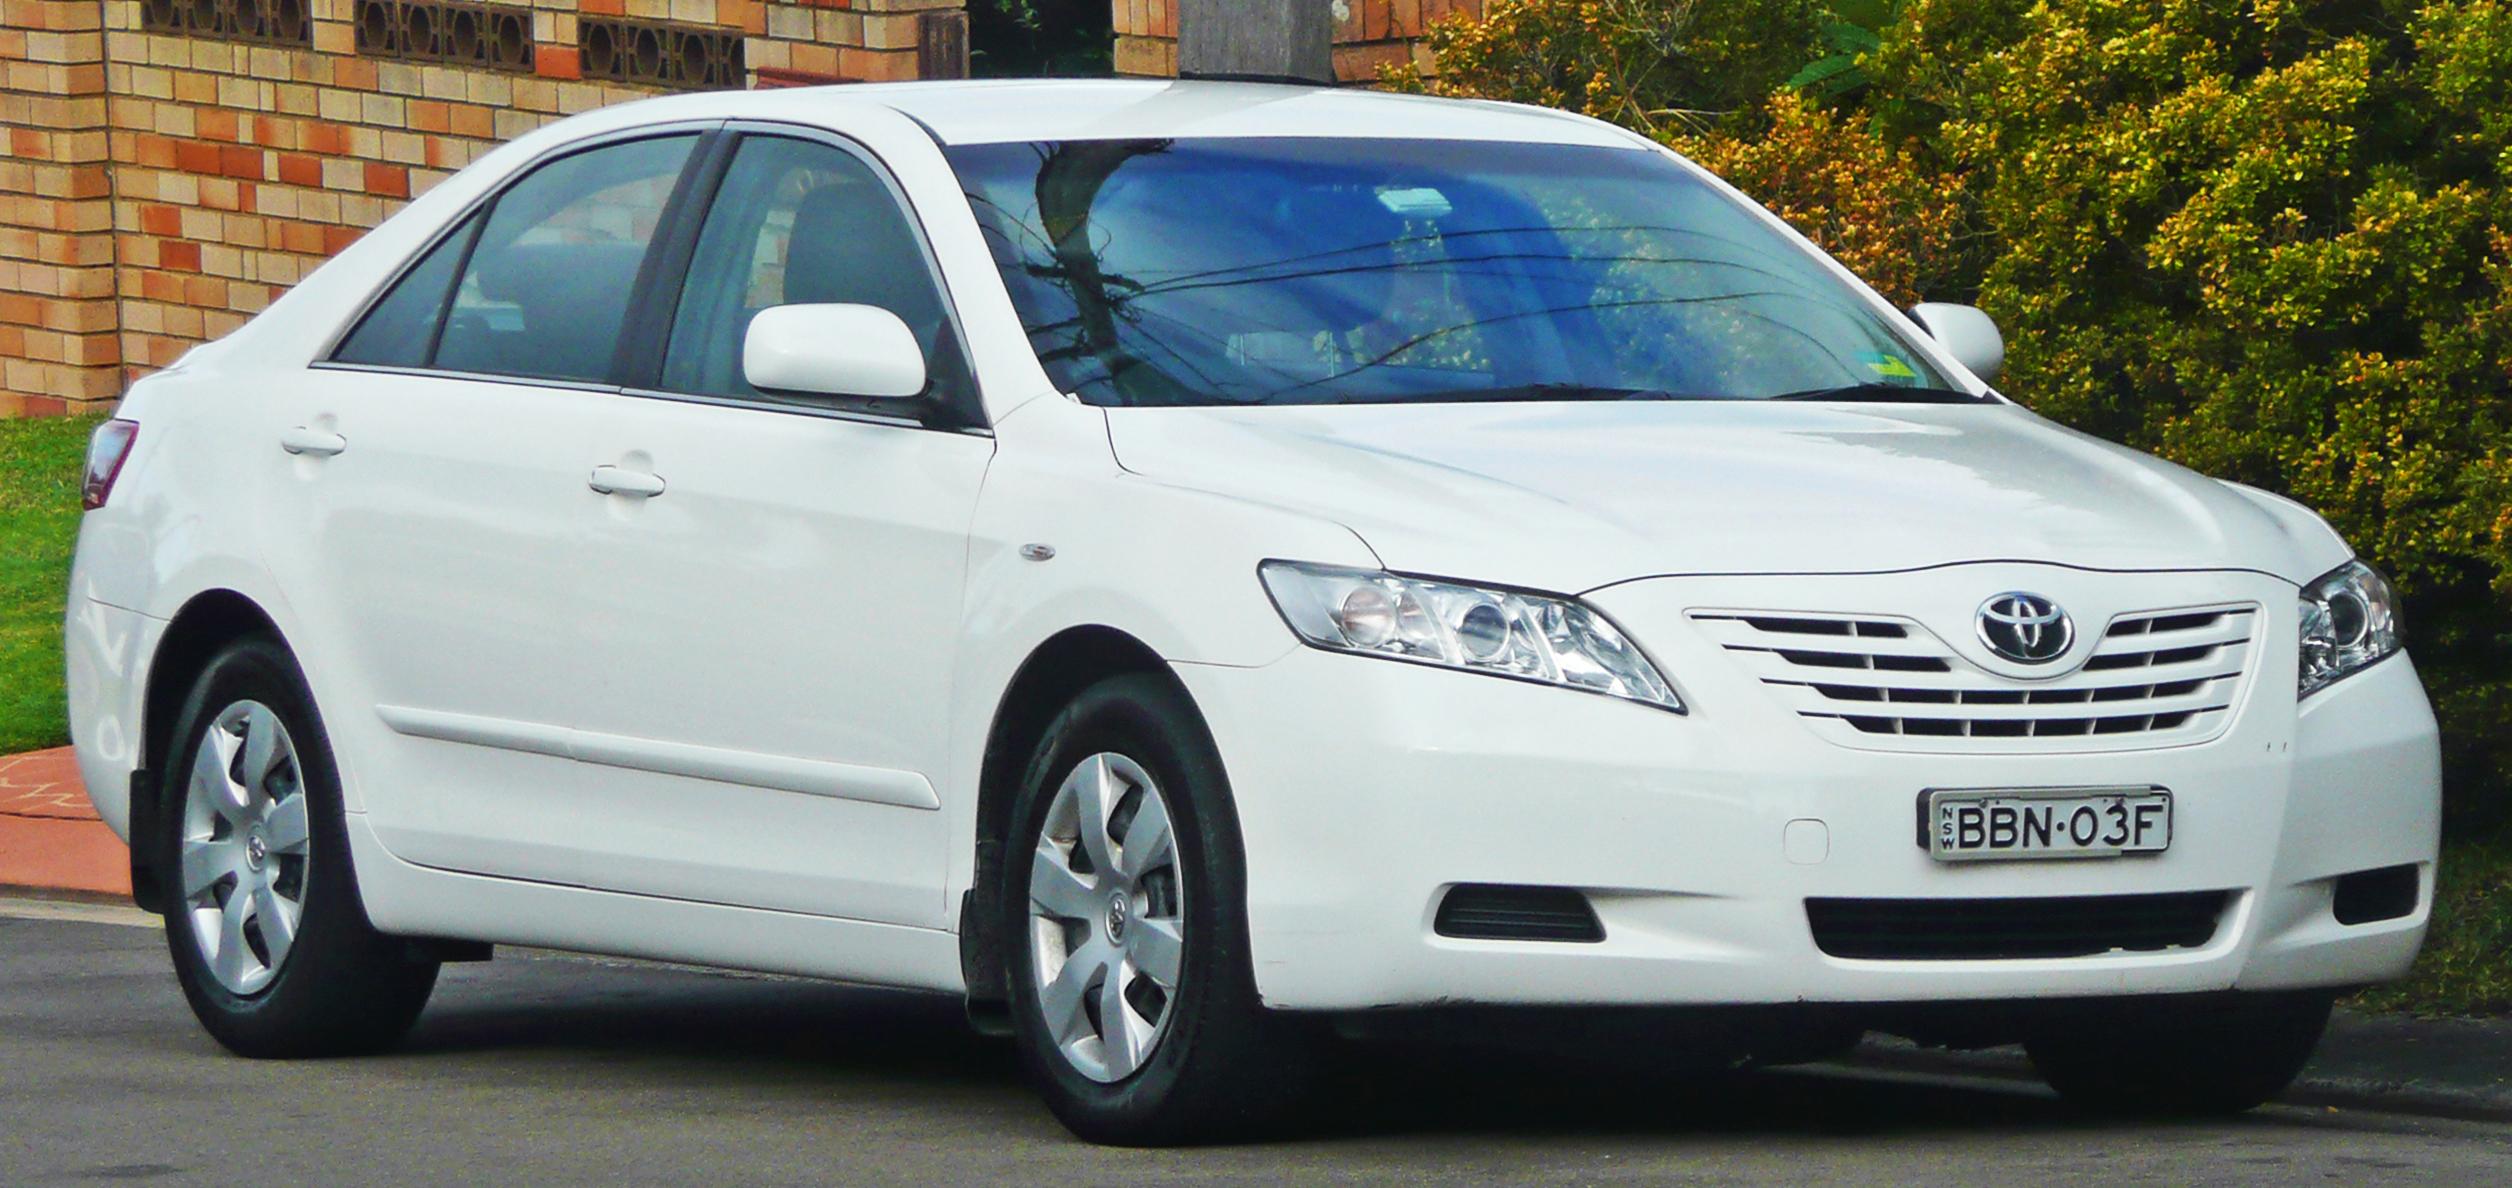 2006 Toyota Camry Image 15